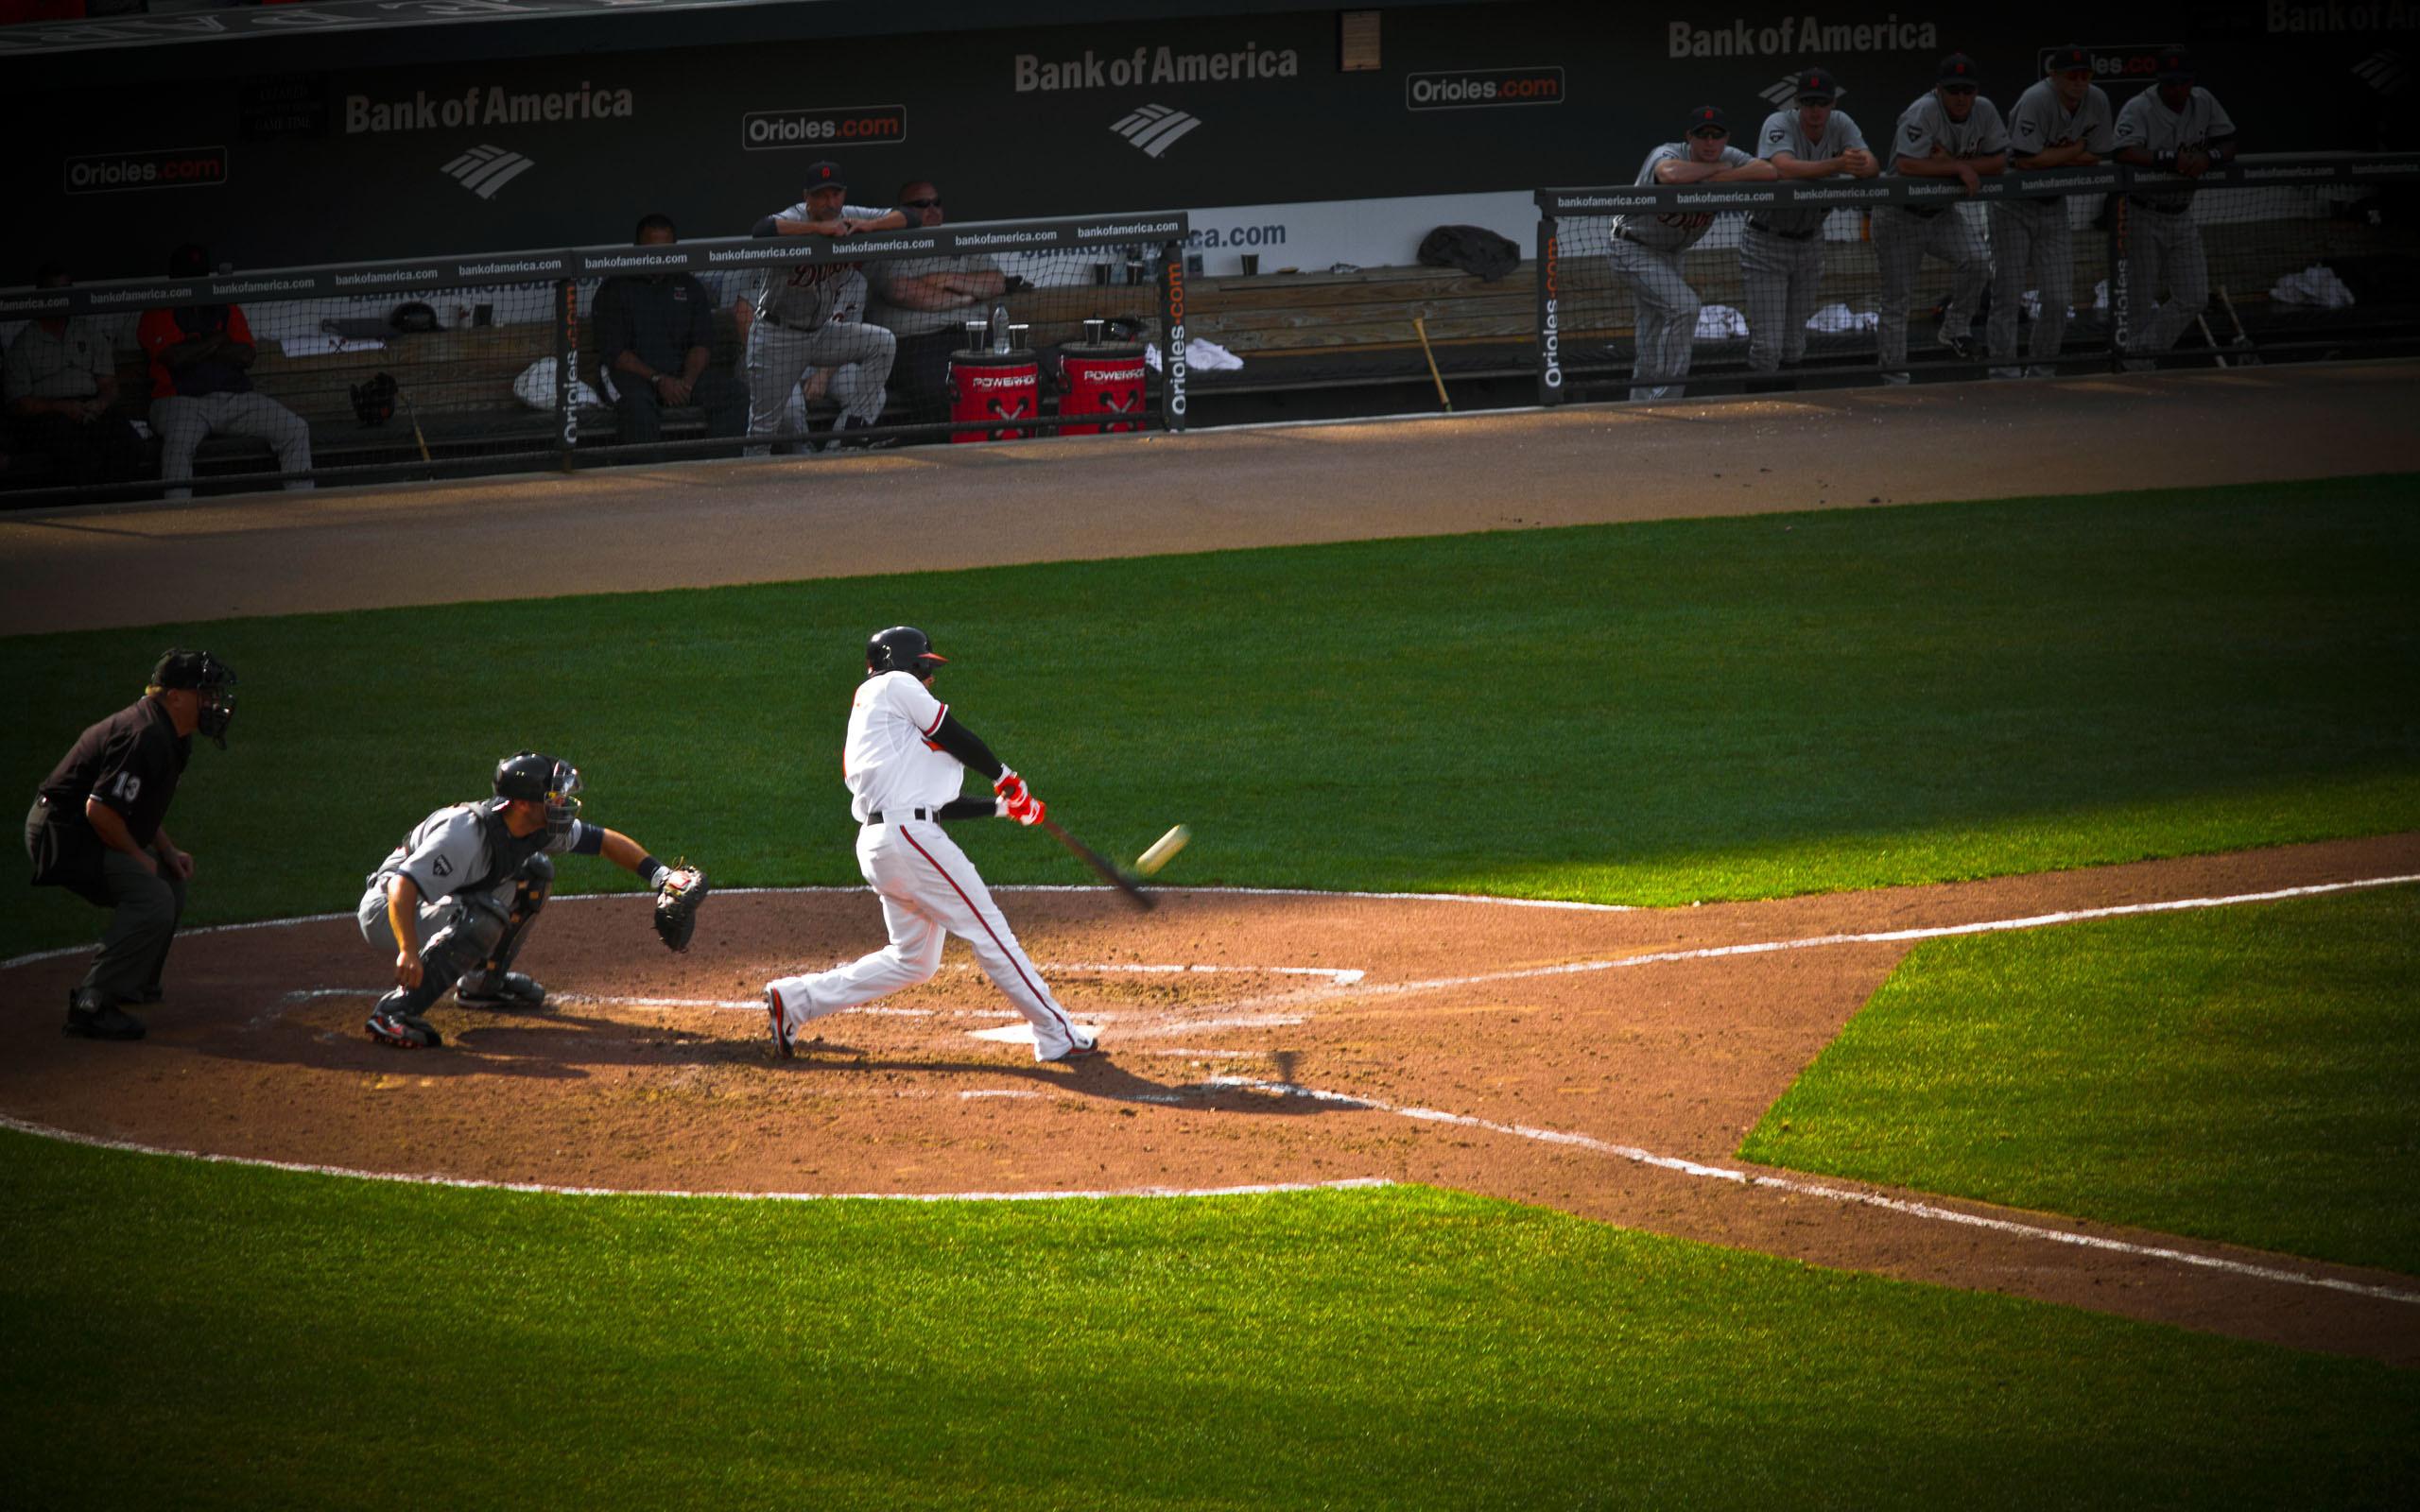 Baltimore Orioles Game, Orioles, Mlb, Sports, Baltimore Orioles, Baseball,  The